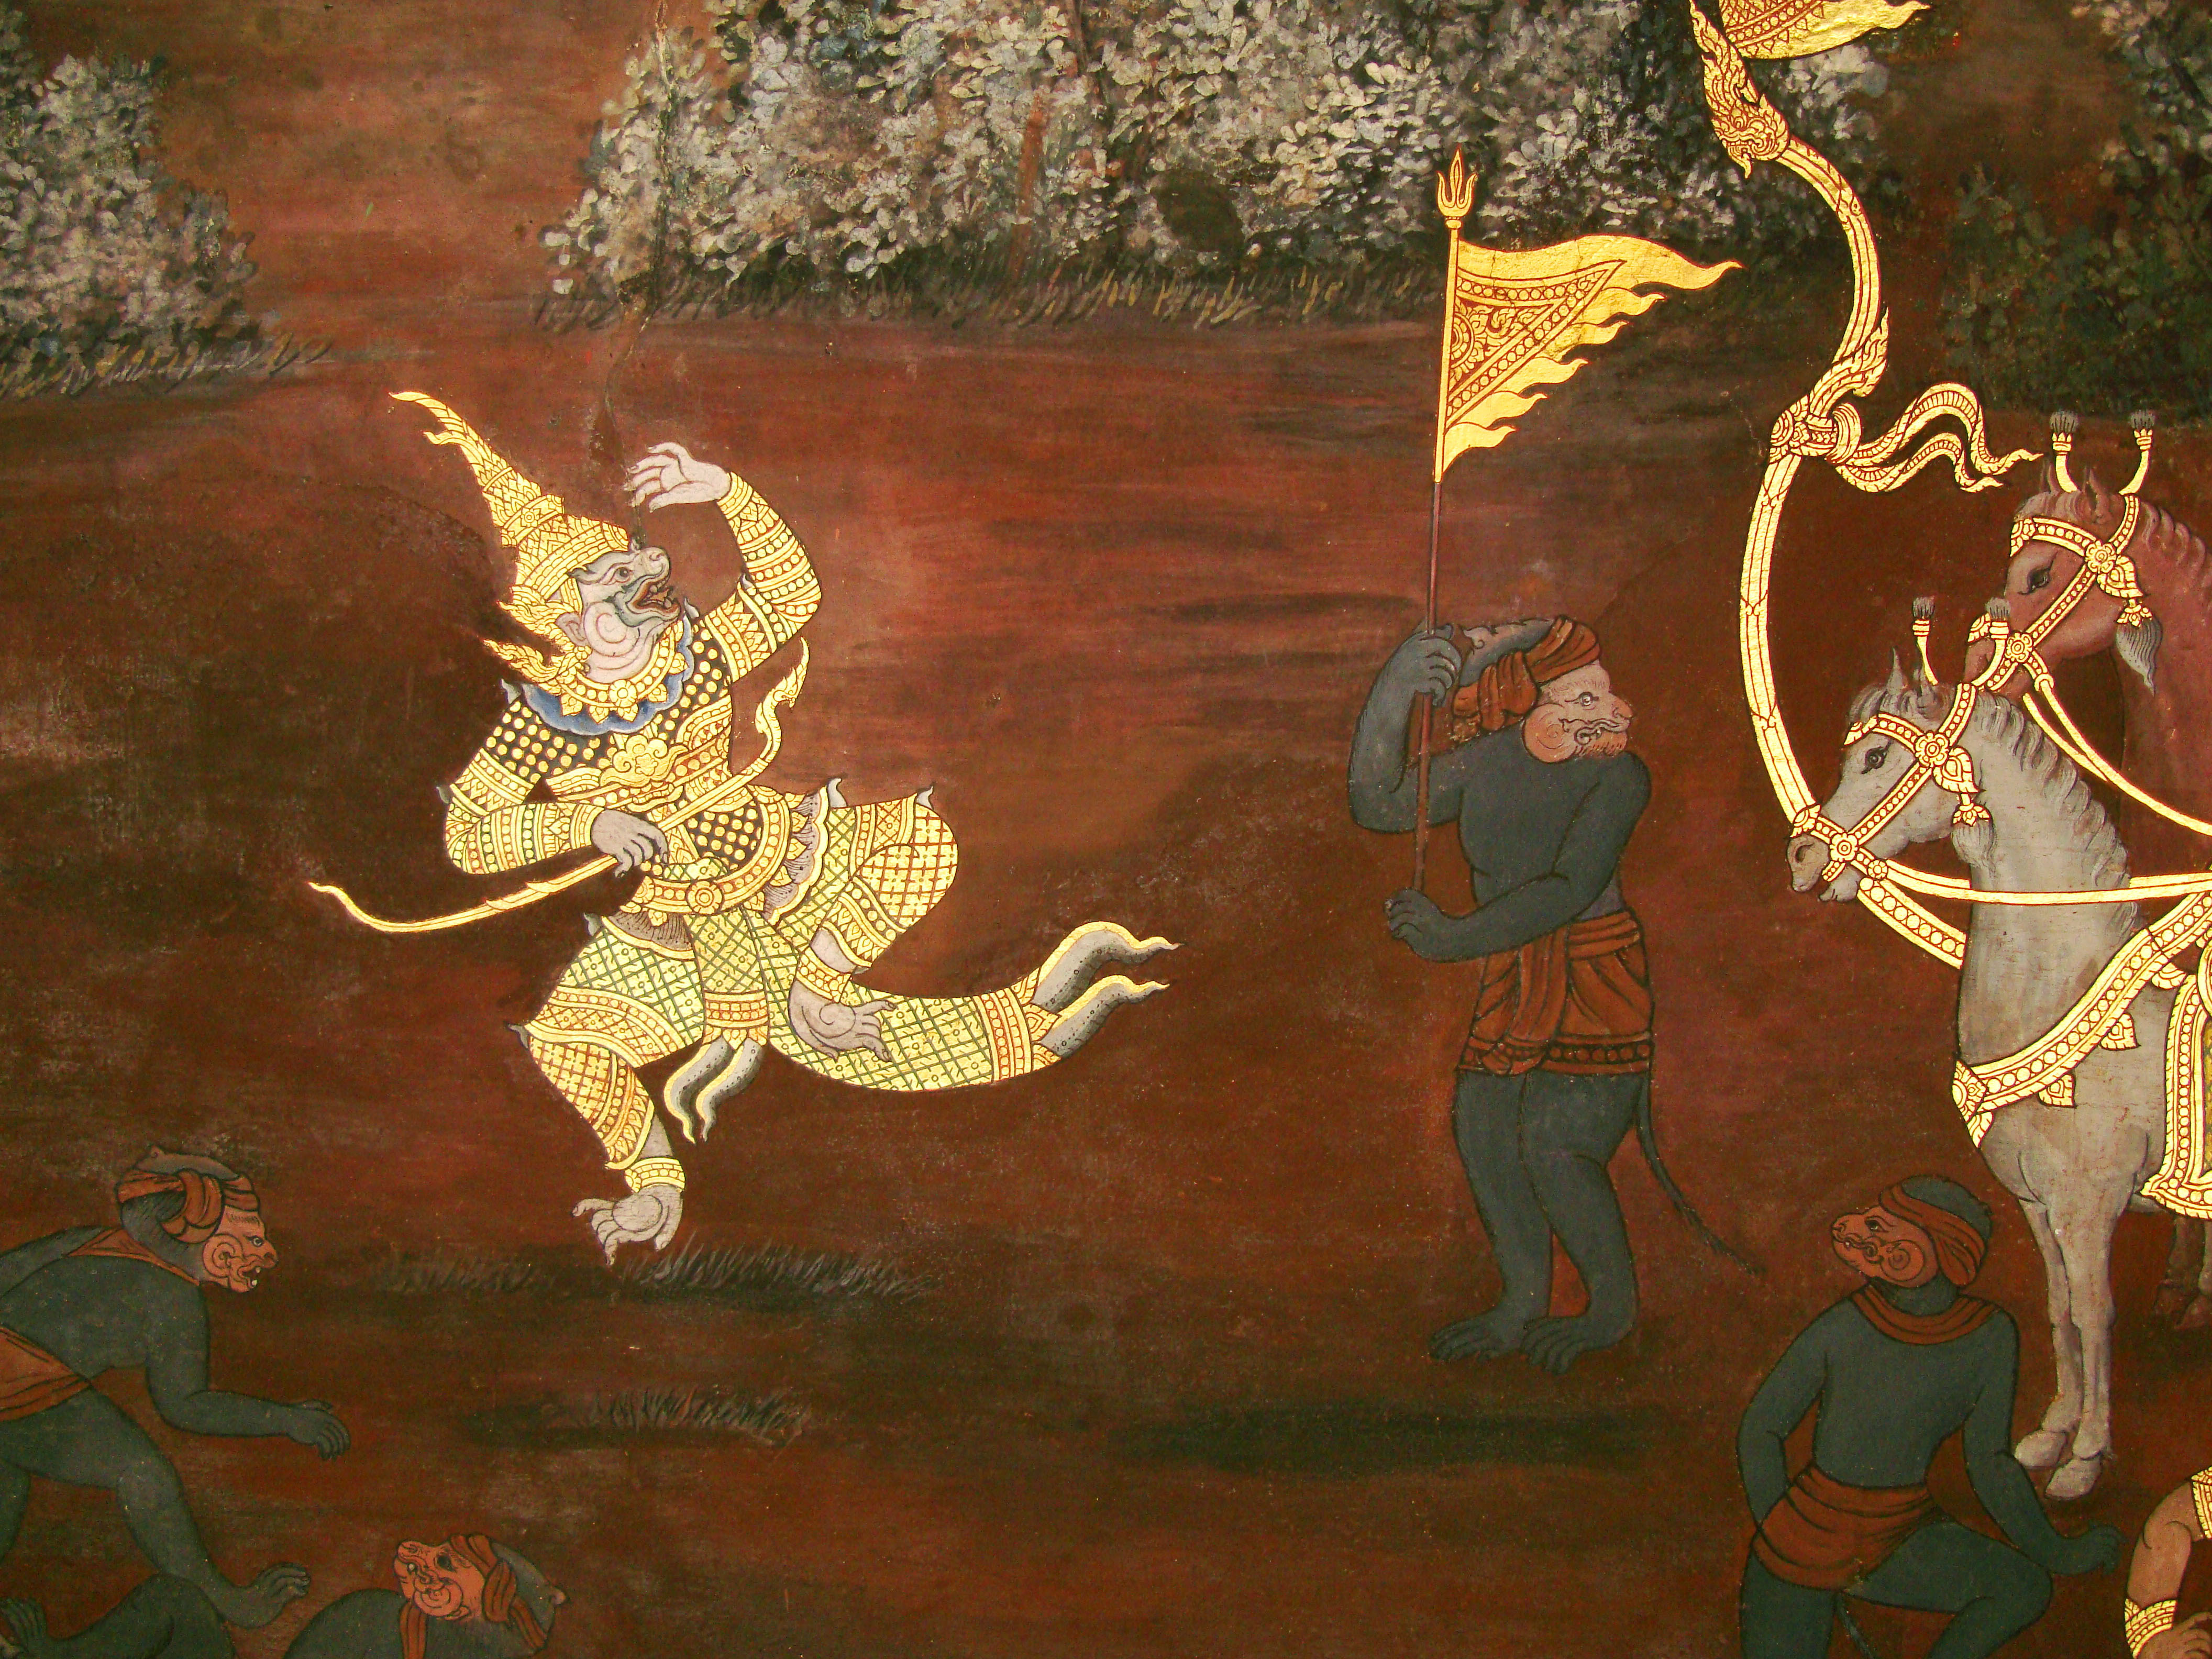 Grand Palace Gold leaf Buddhist artwork Bangkok Thailand 40